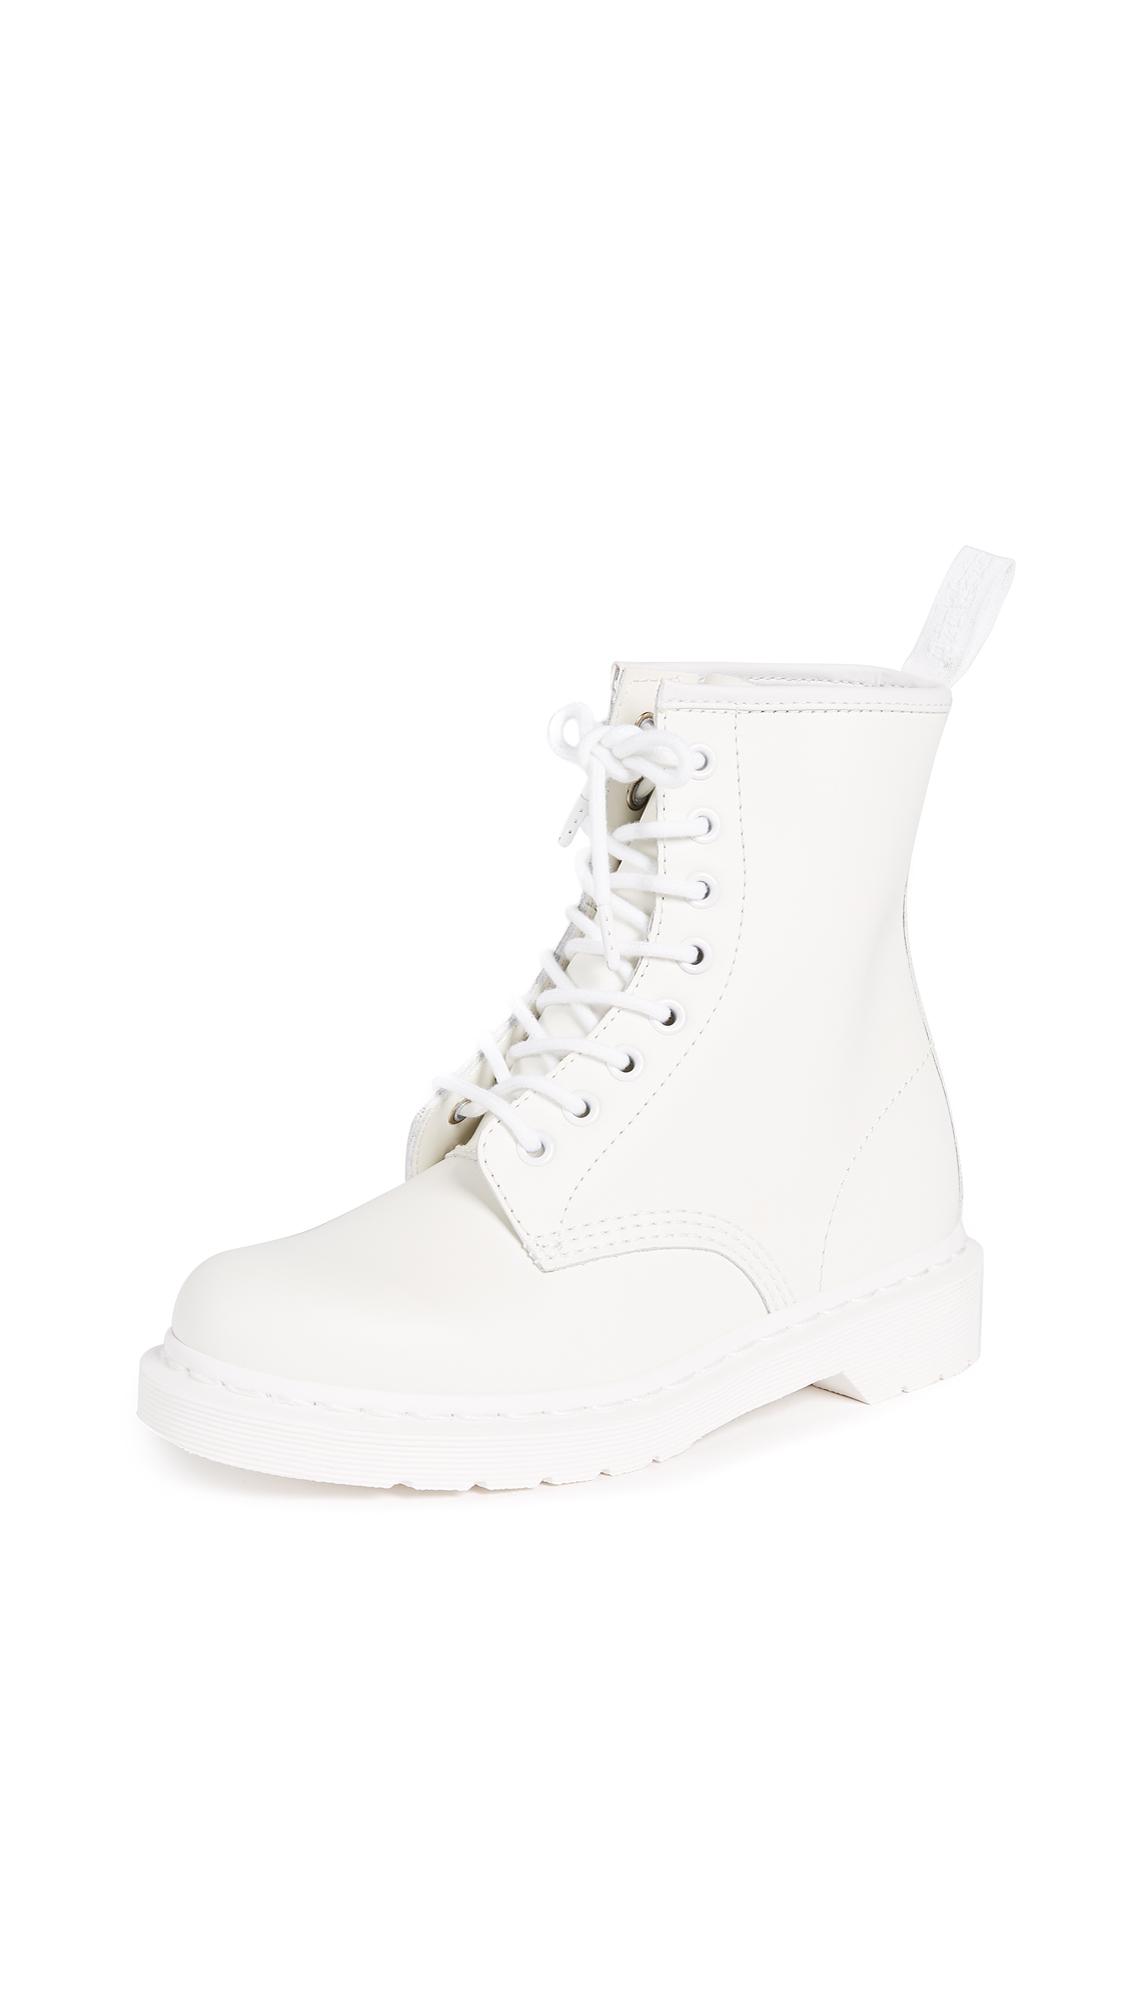 Dr. Martens 1460 Mono 8 Eye Boots - White